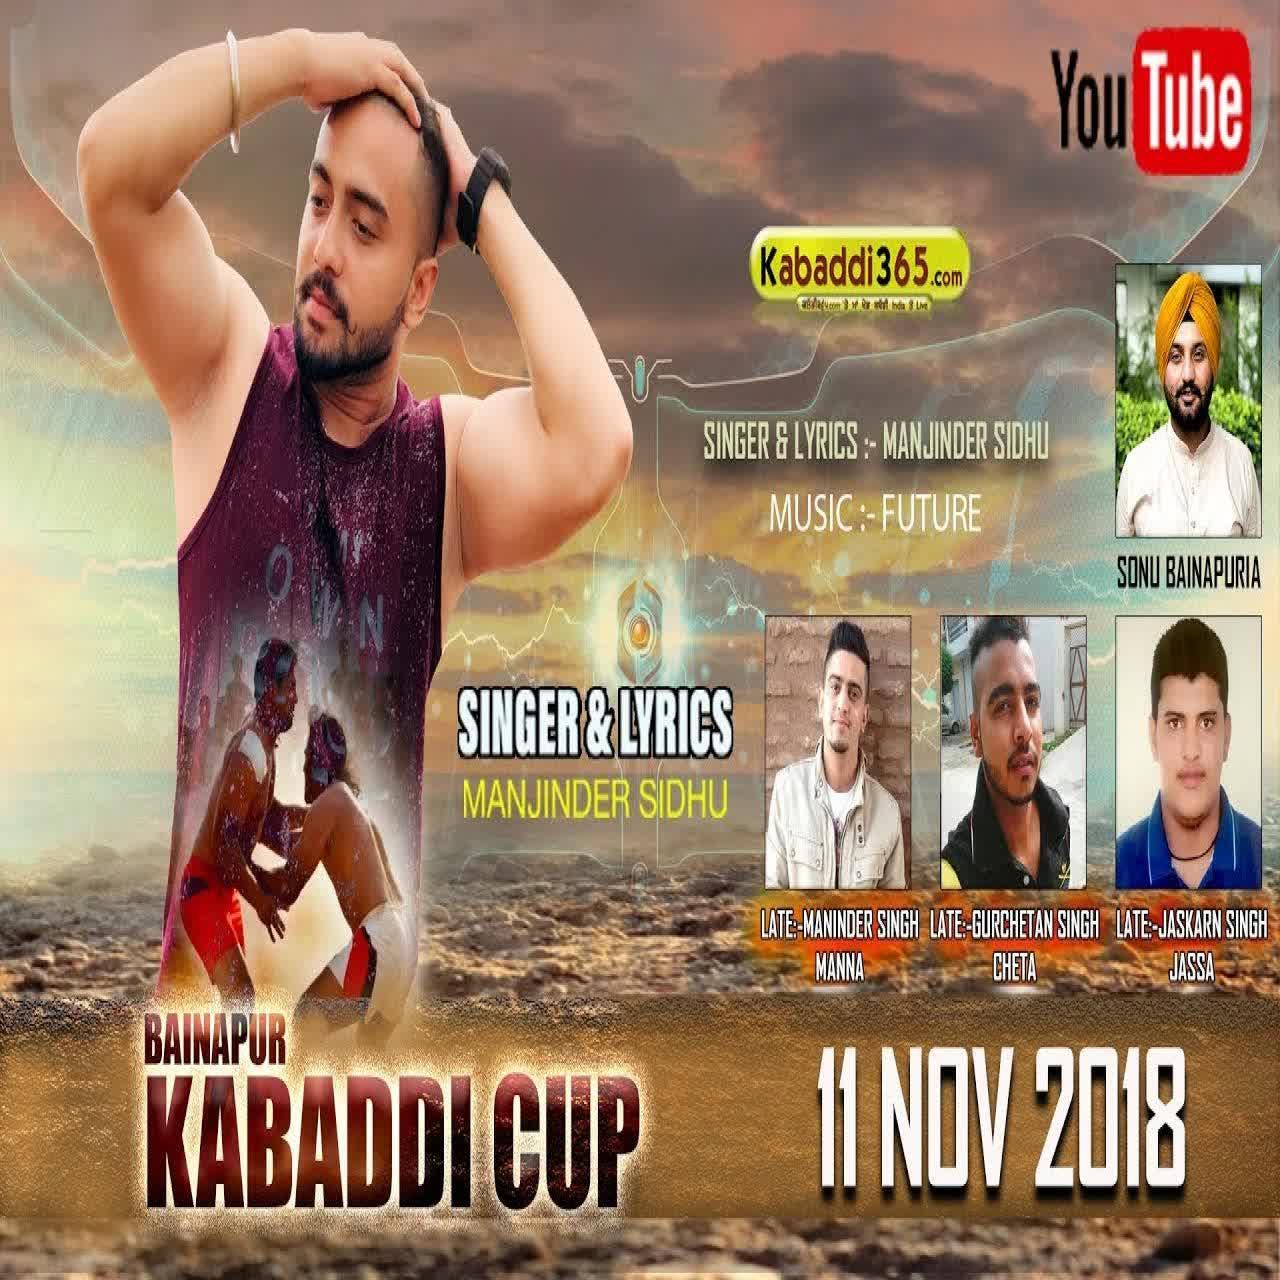 Kabaddi Cup Manjinder Sidhu